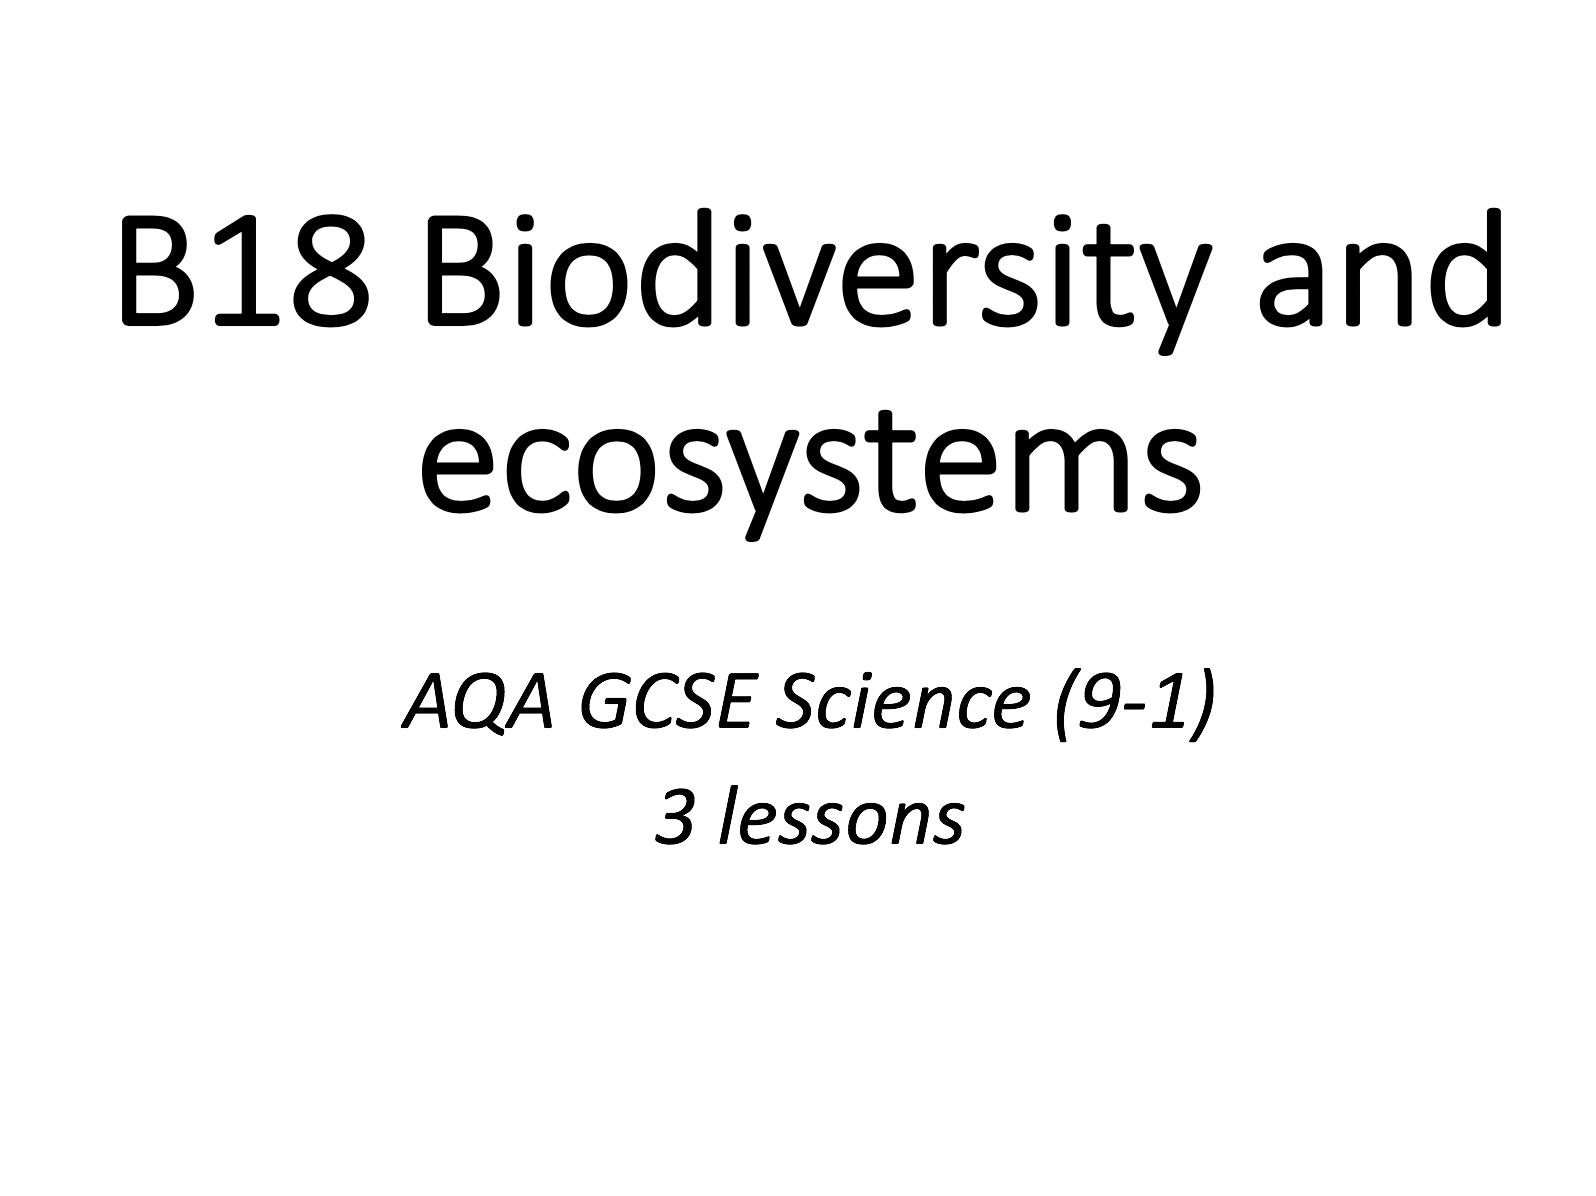 B18 Biodiversity and ecosystems